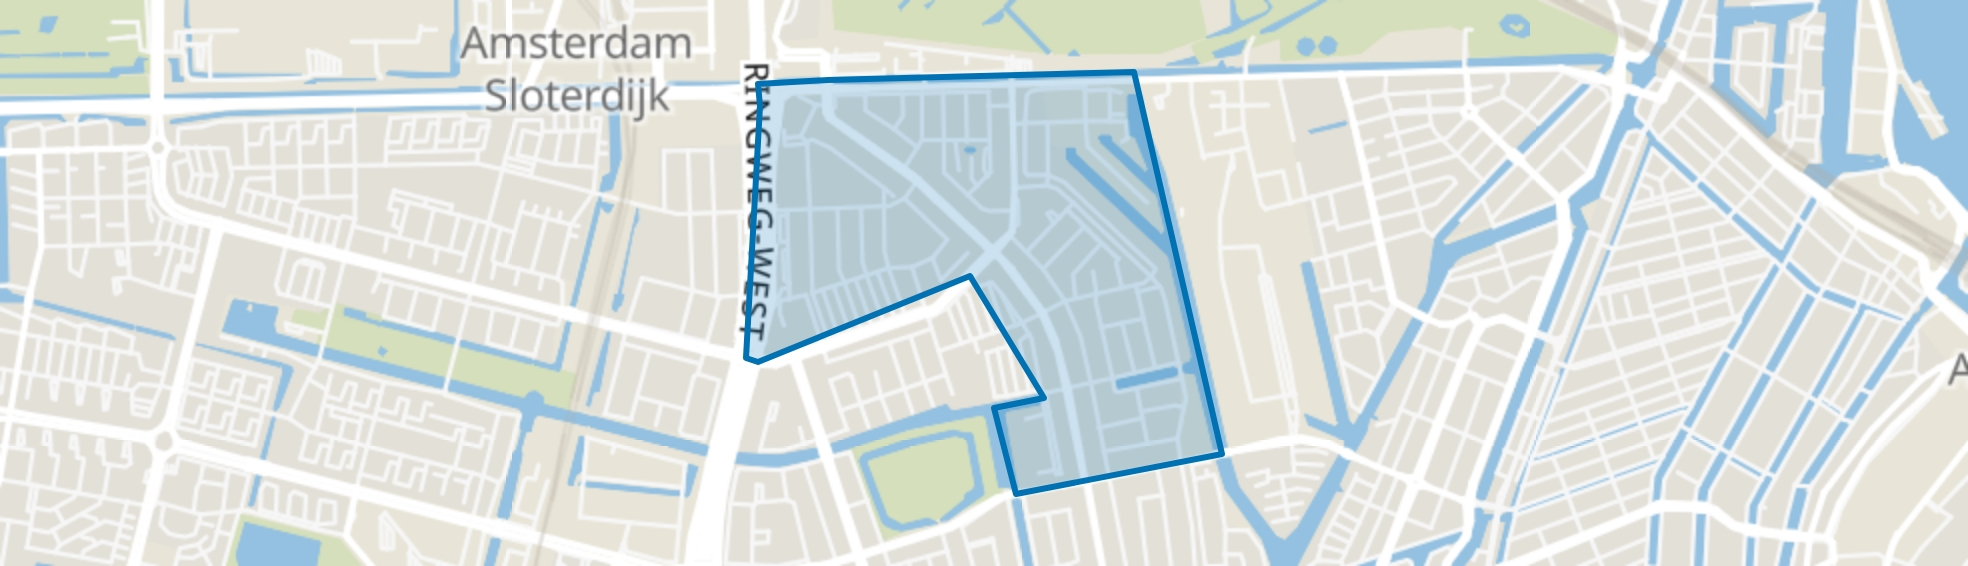 Landlust, Amsterdam map